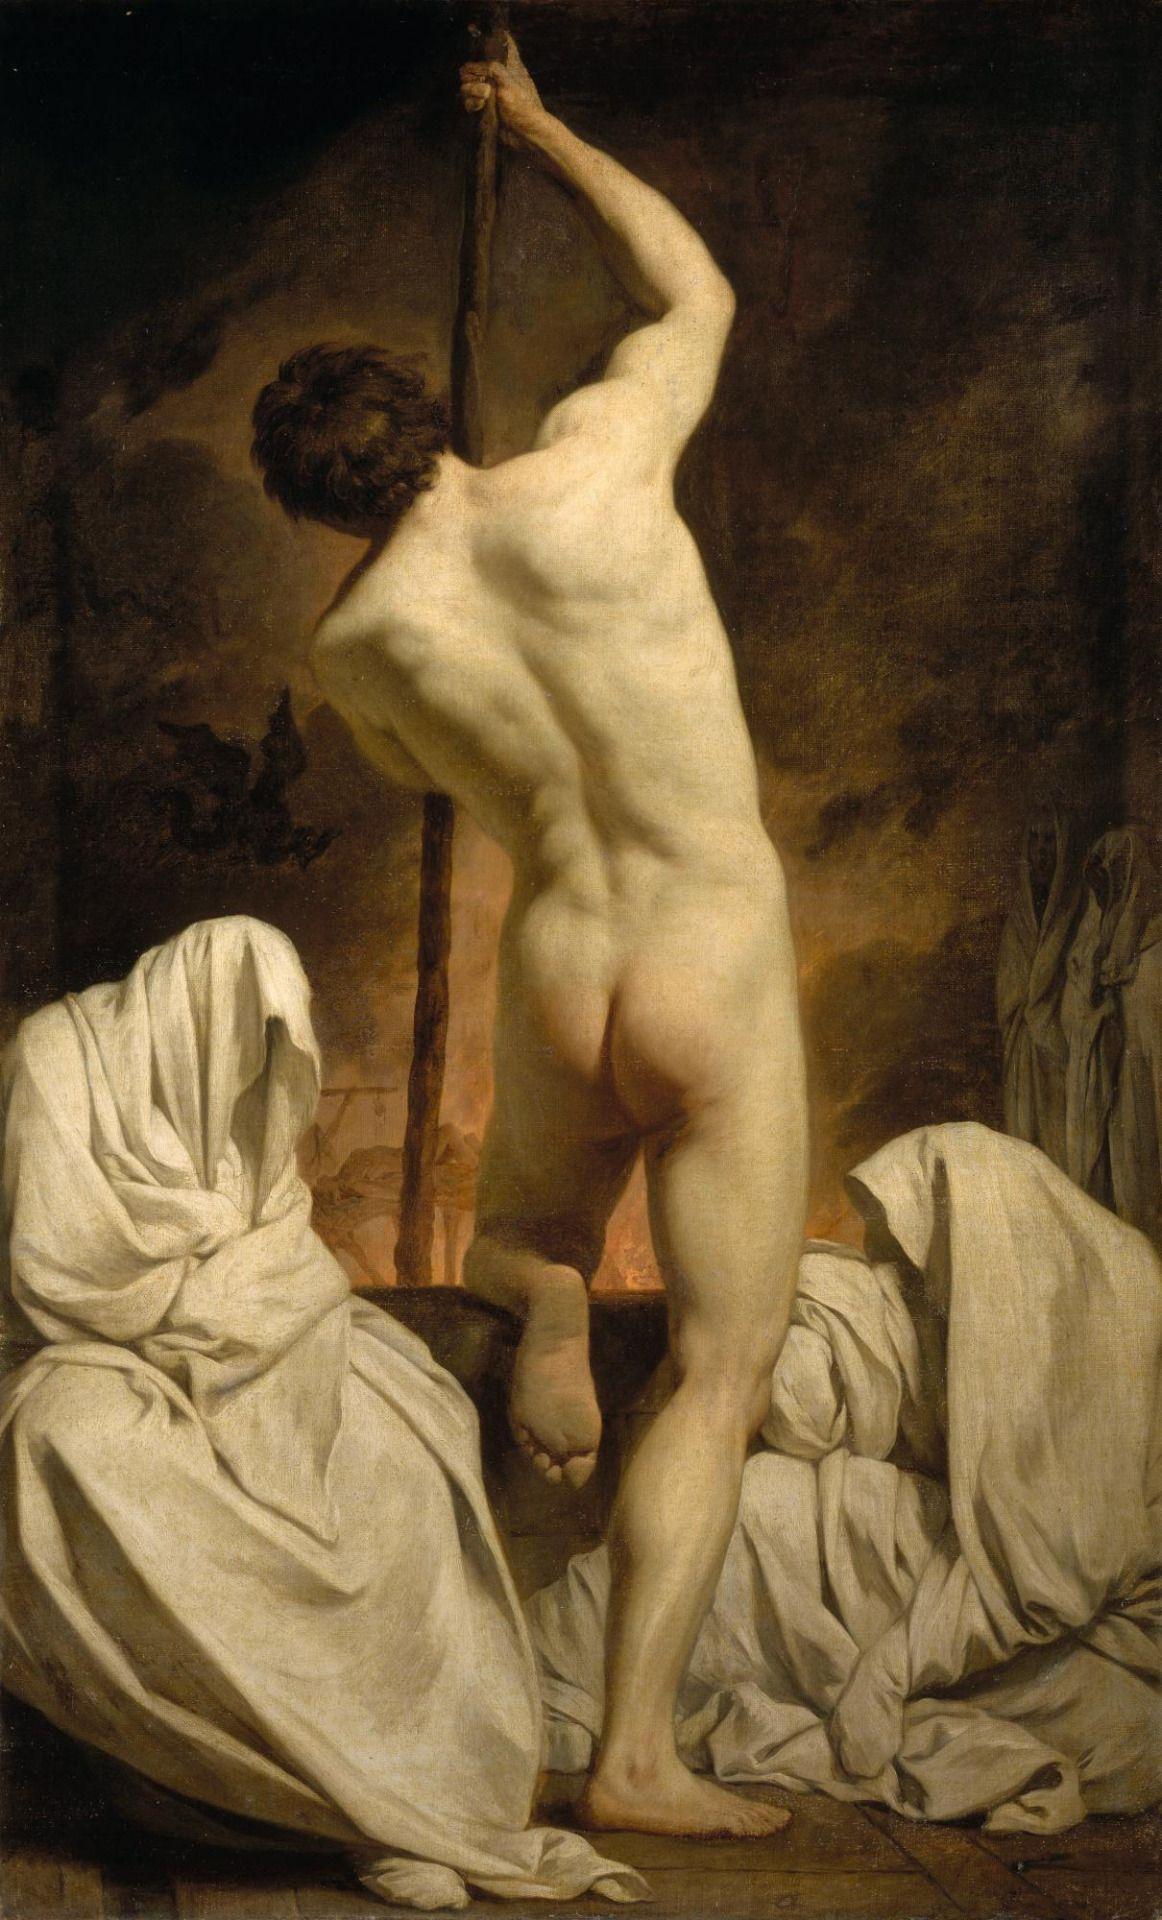 Figura 7 - Pierre Soubleyras, Caronte passando as sombras